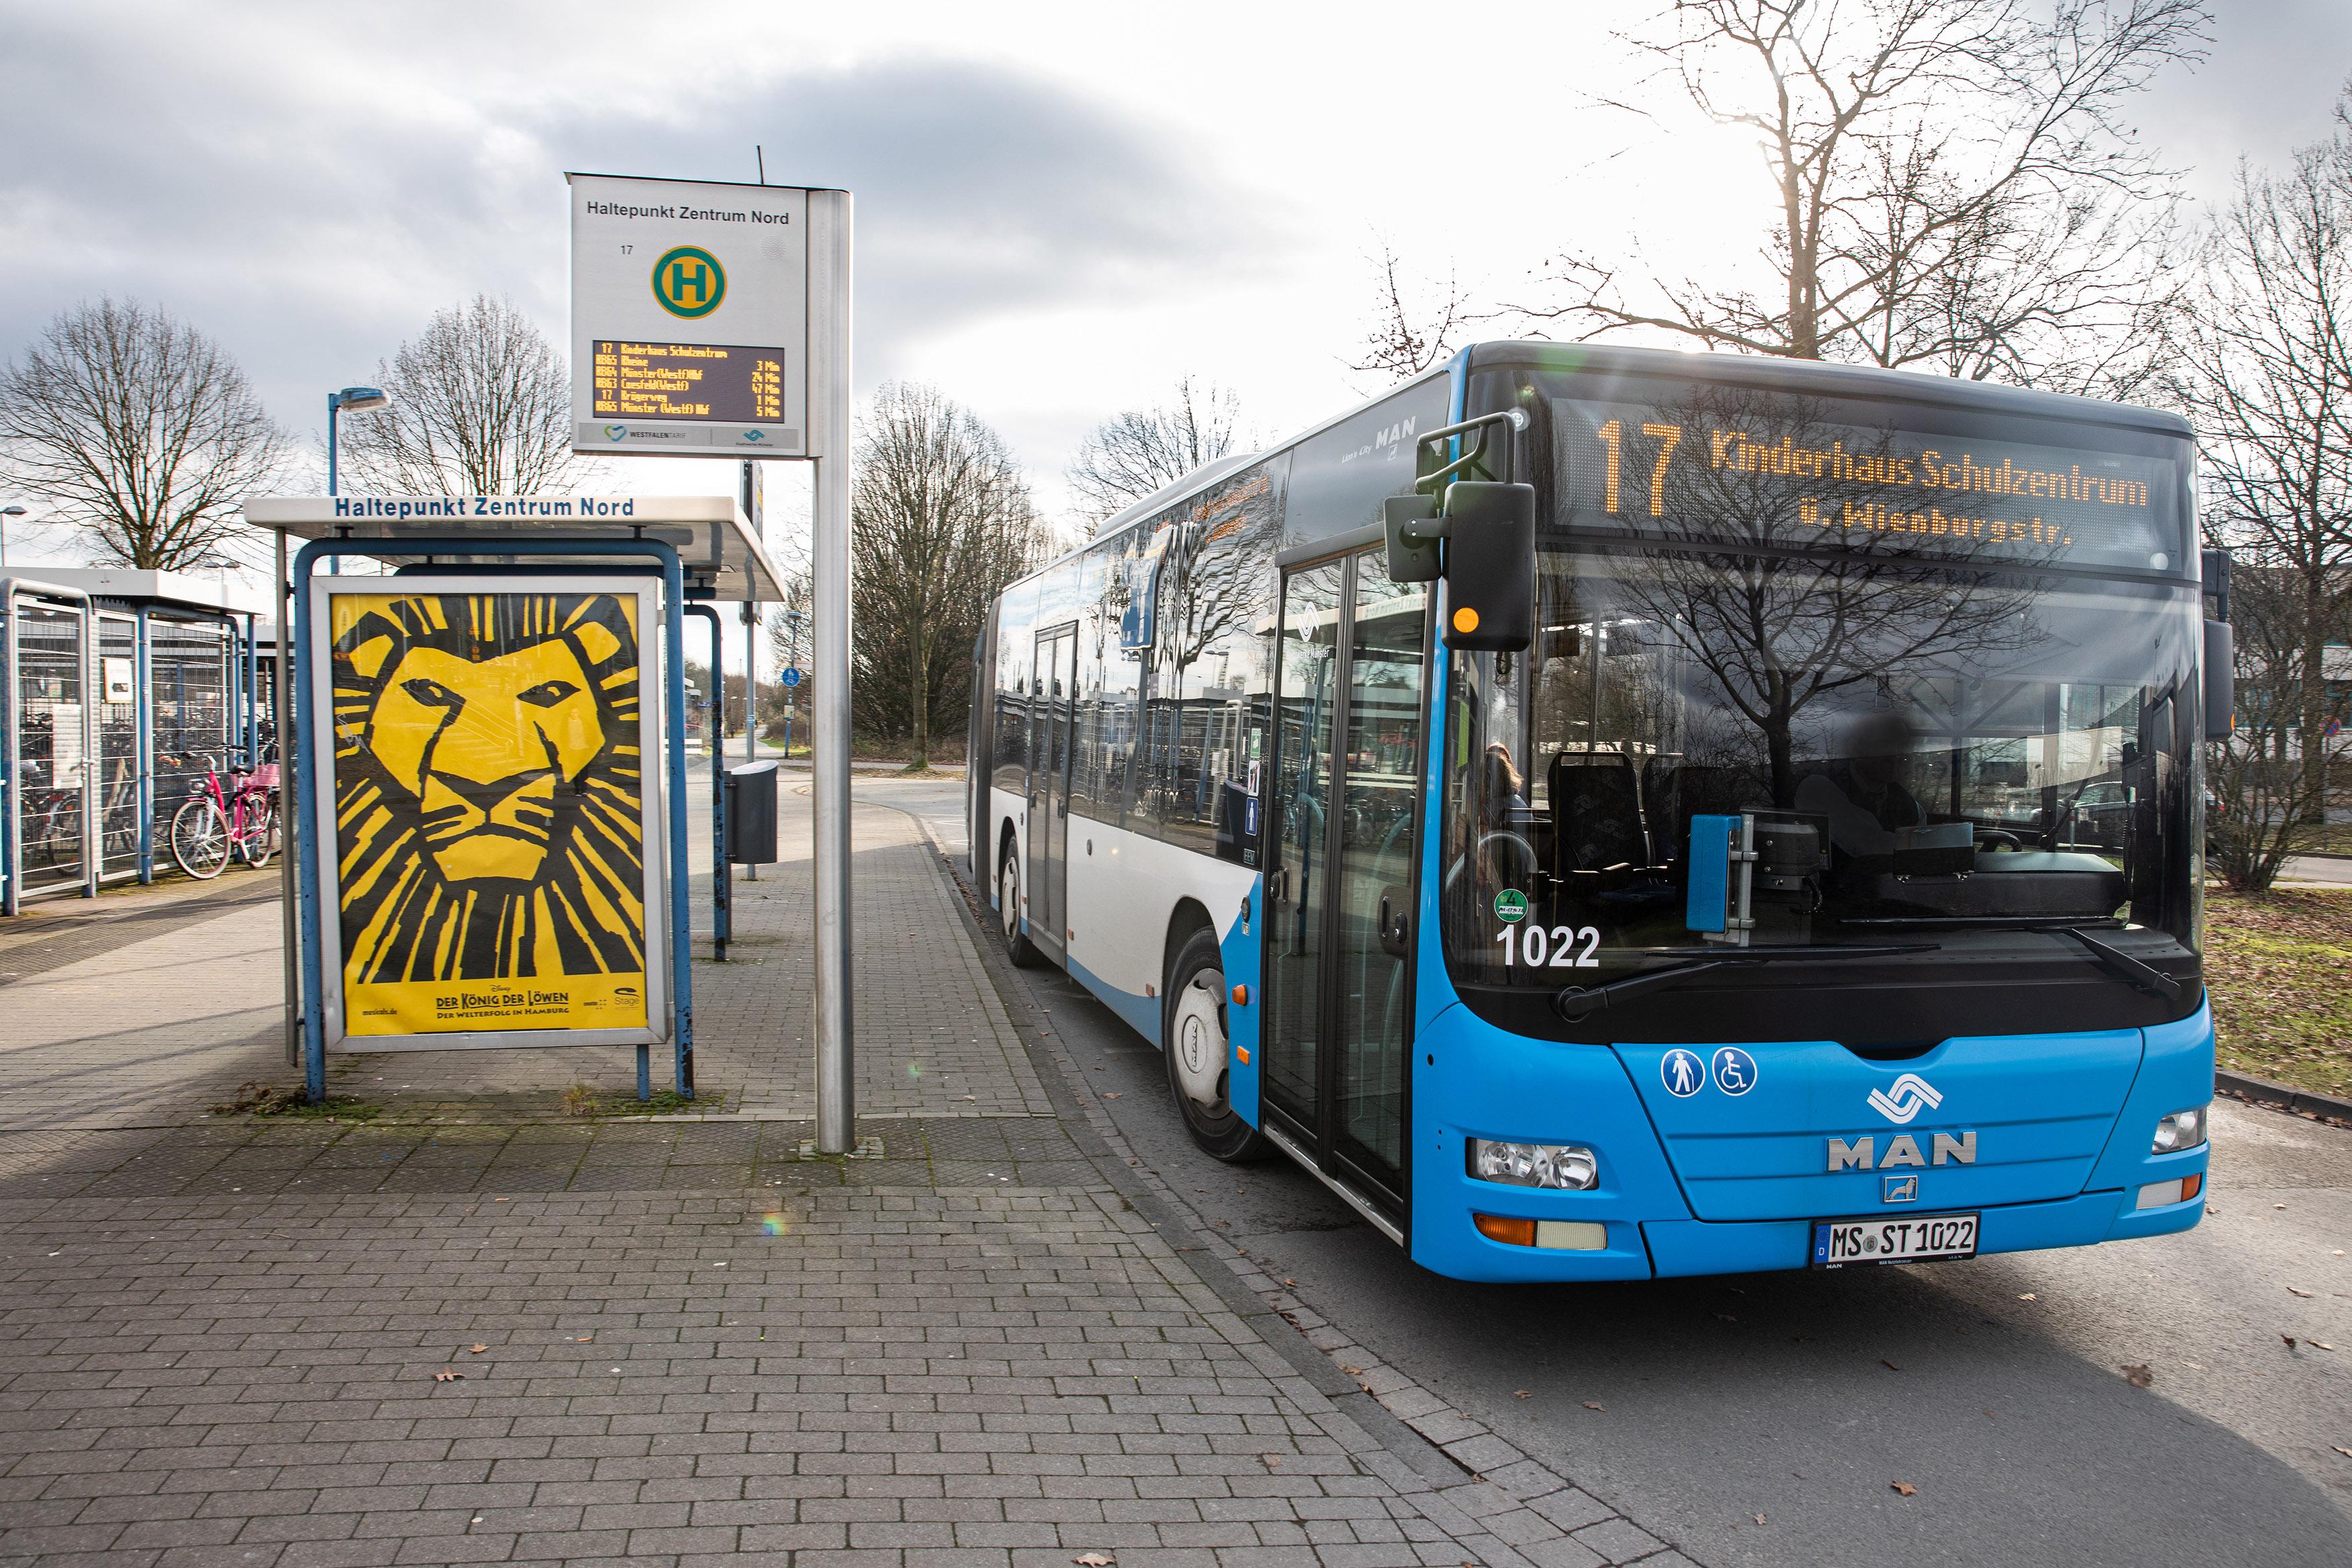 Perverserchikan Im Bus